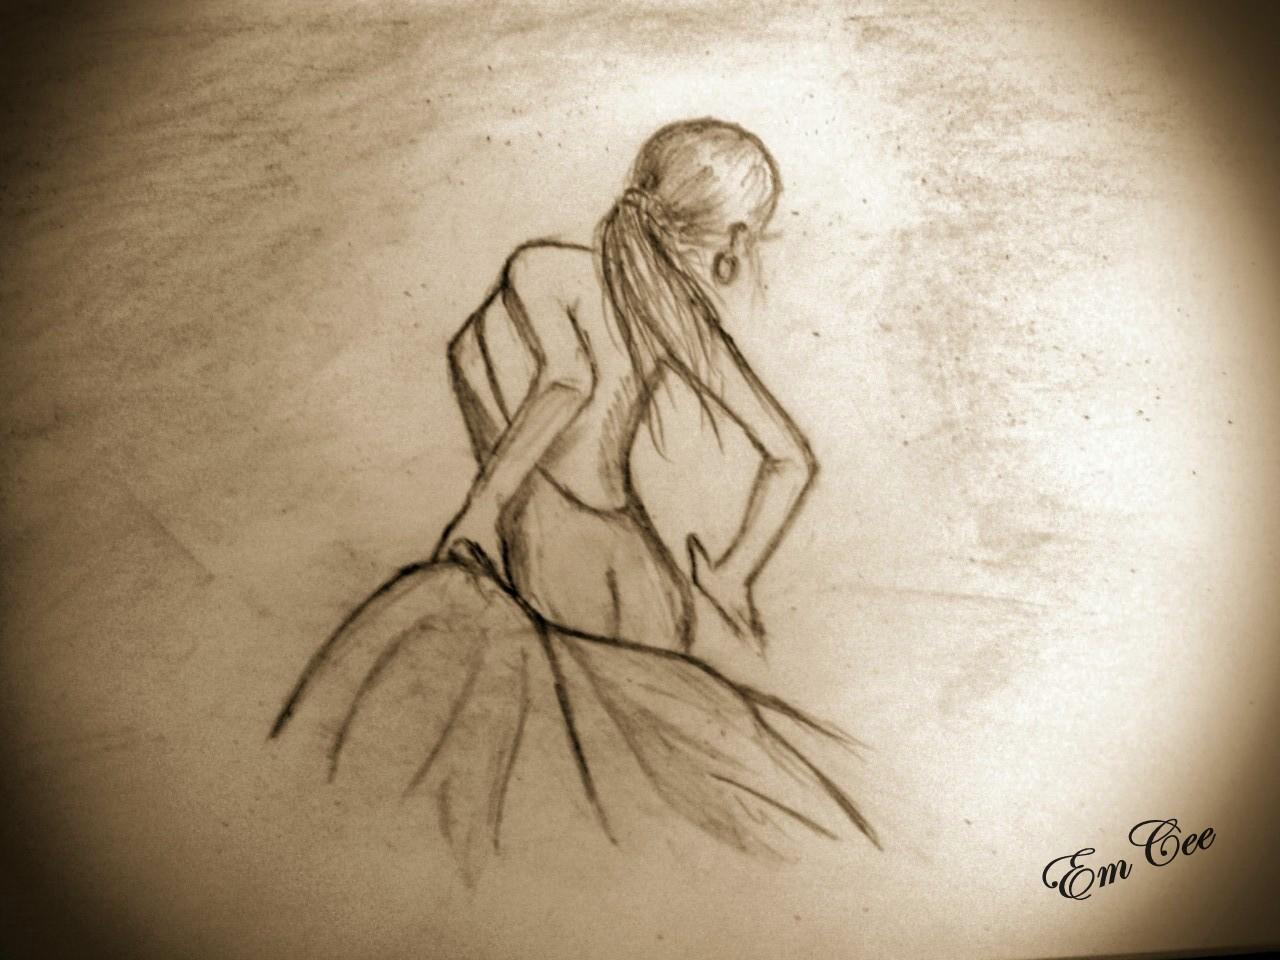 1280x960 Pencil Sketch Of Dancing Girl A Rat's Nibble Enchanted